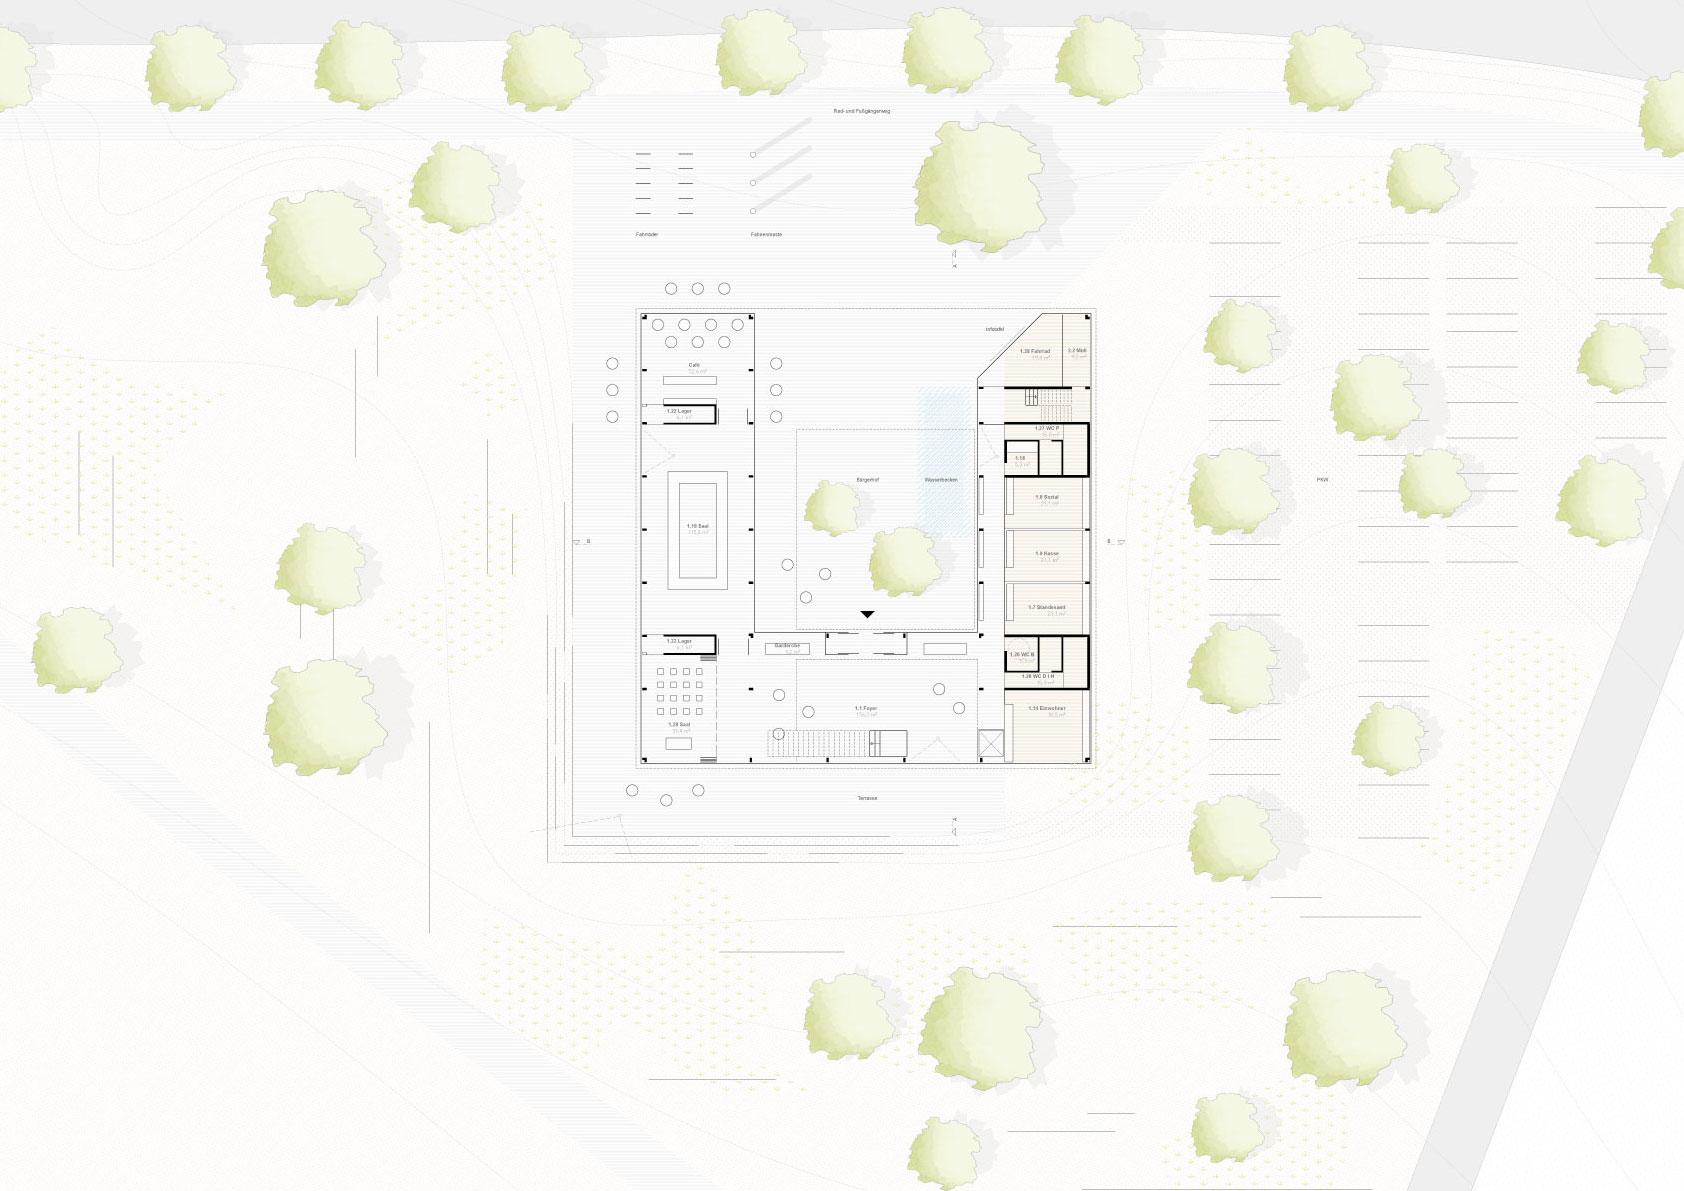 STUDIOKUBIK-KUBIK-architektur-architecture-berlin-RMP-skizze-obergeschoss-1st-floor